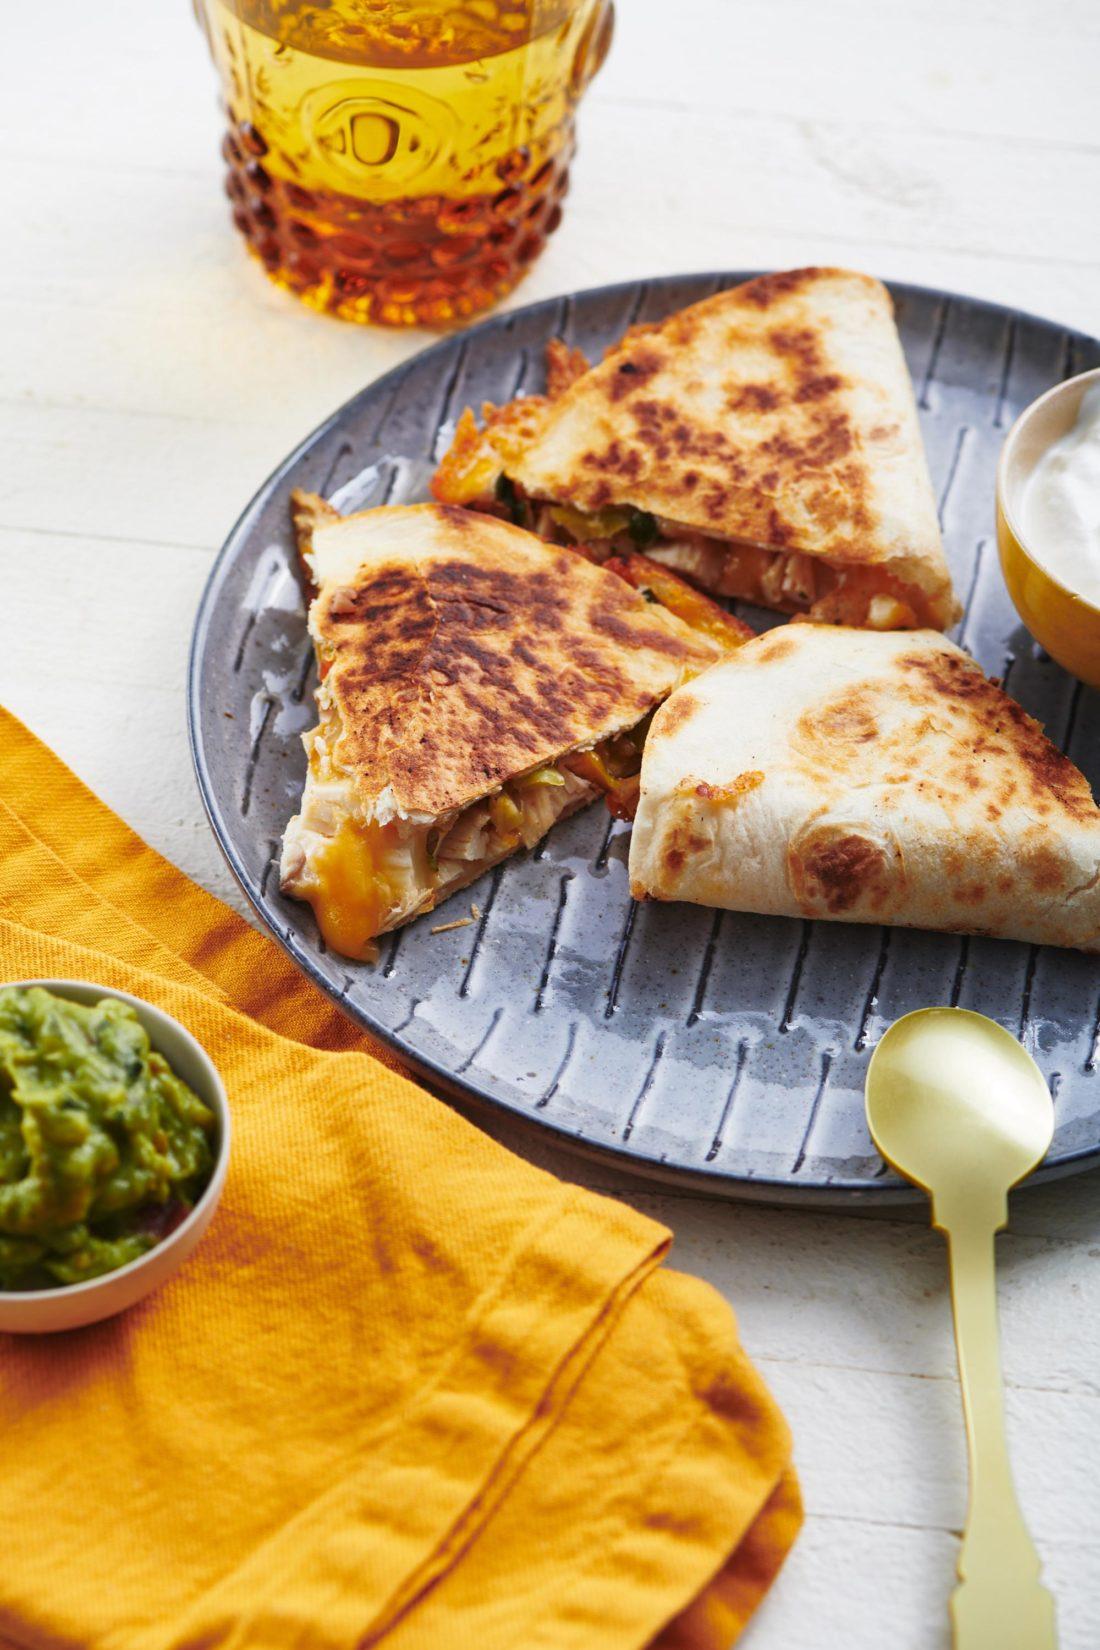 Overstuffed Chicken and Vegetable Quesadillas